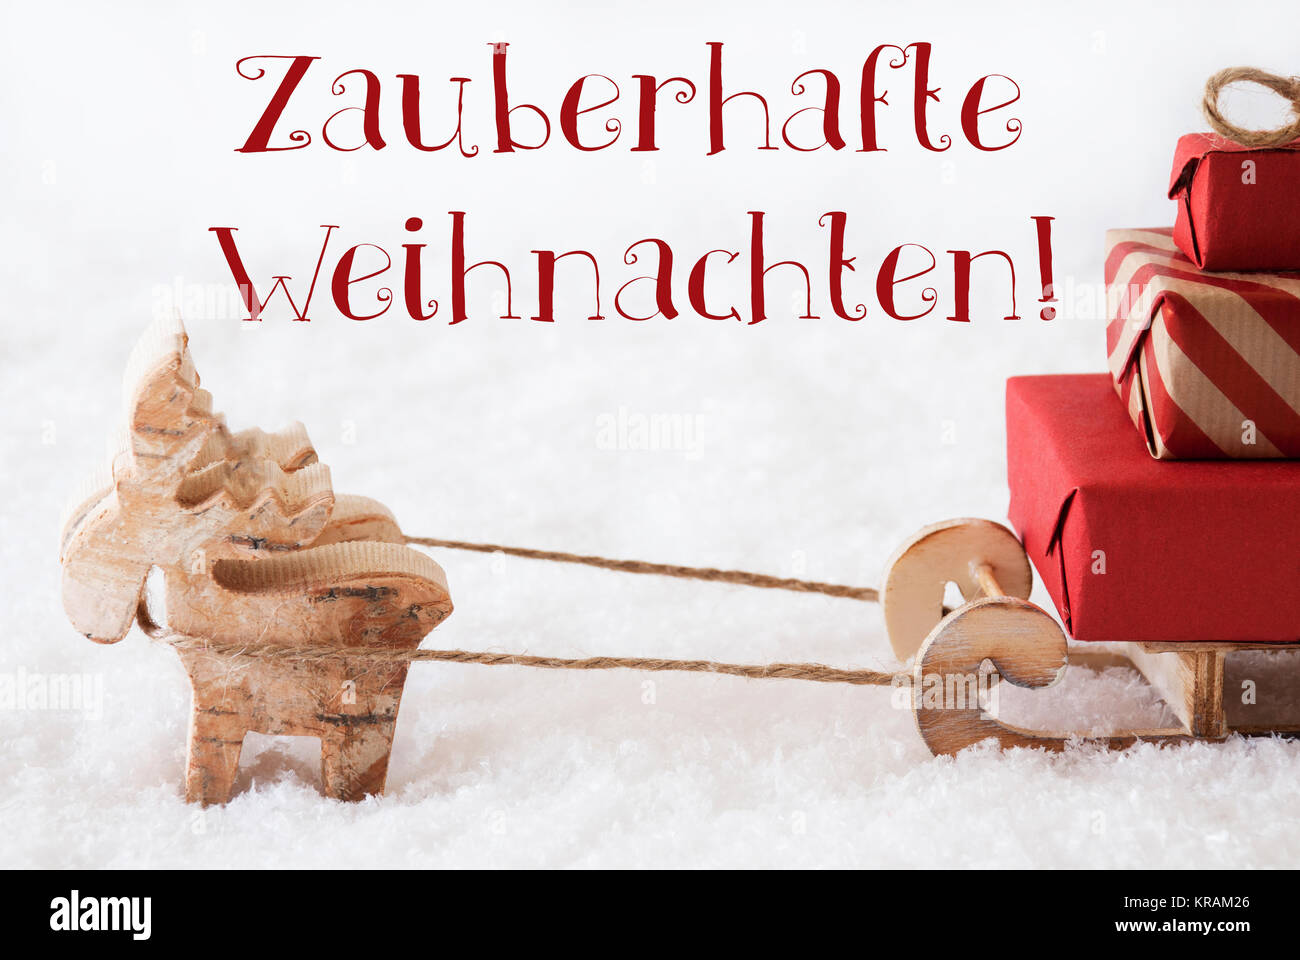 Merry Christmas Greetings In German Stock Photos Merry Christmas